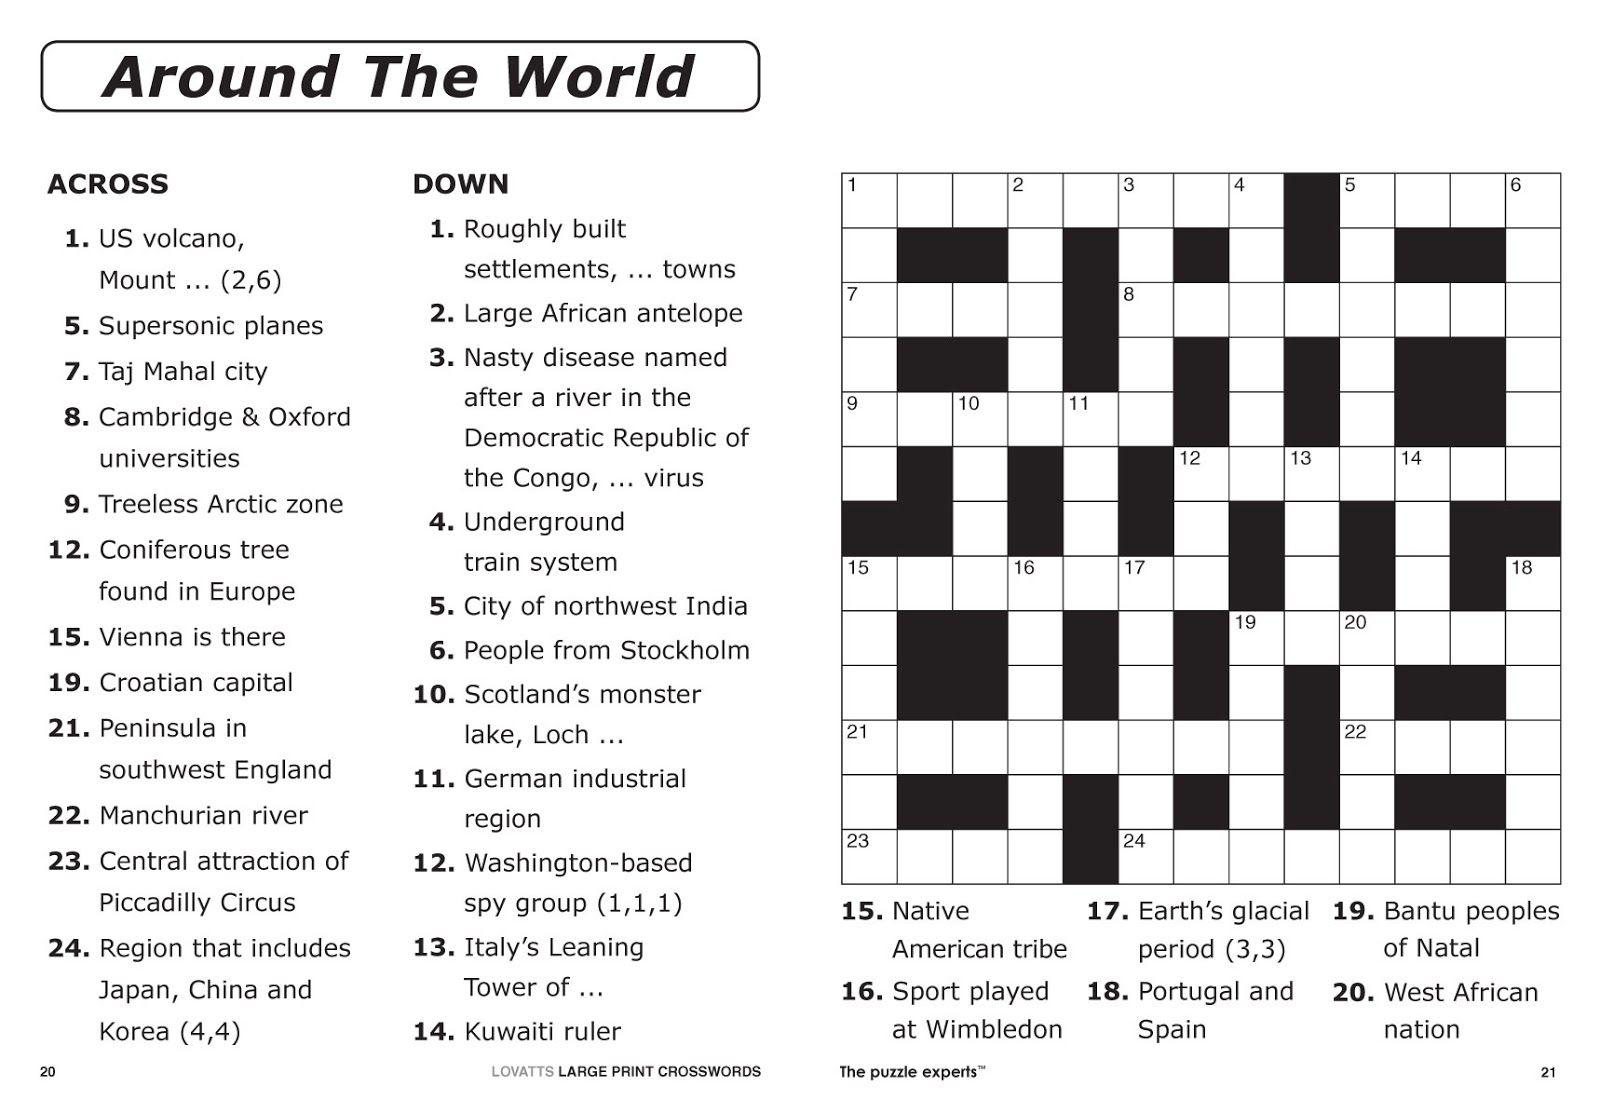 Easy Printable Crossword Puzzles | Elder Care & Dementia Care - Create A Printable Crossword Puzzle